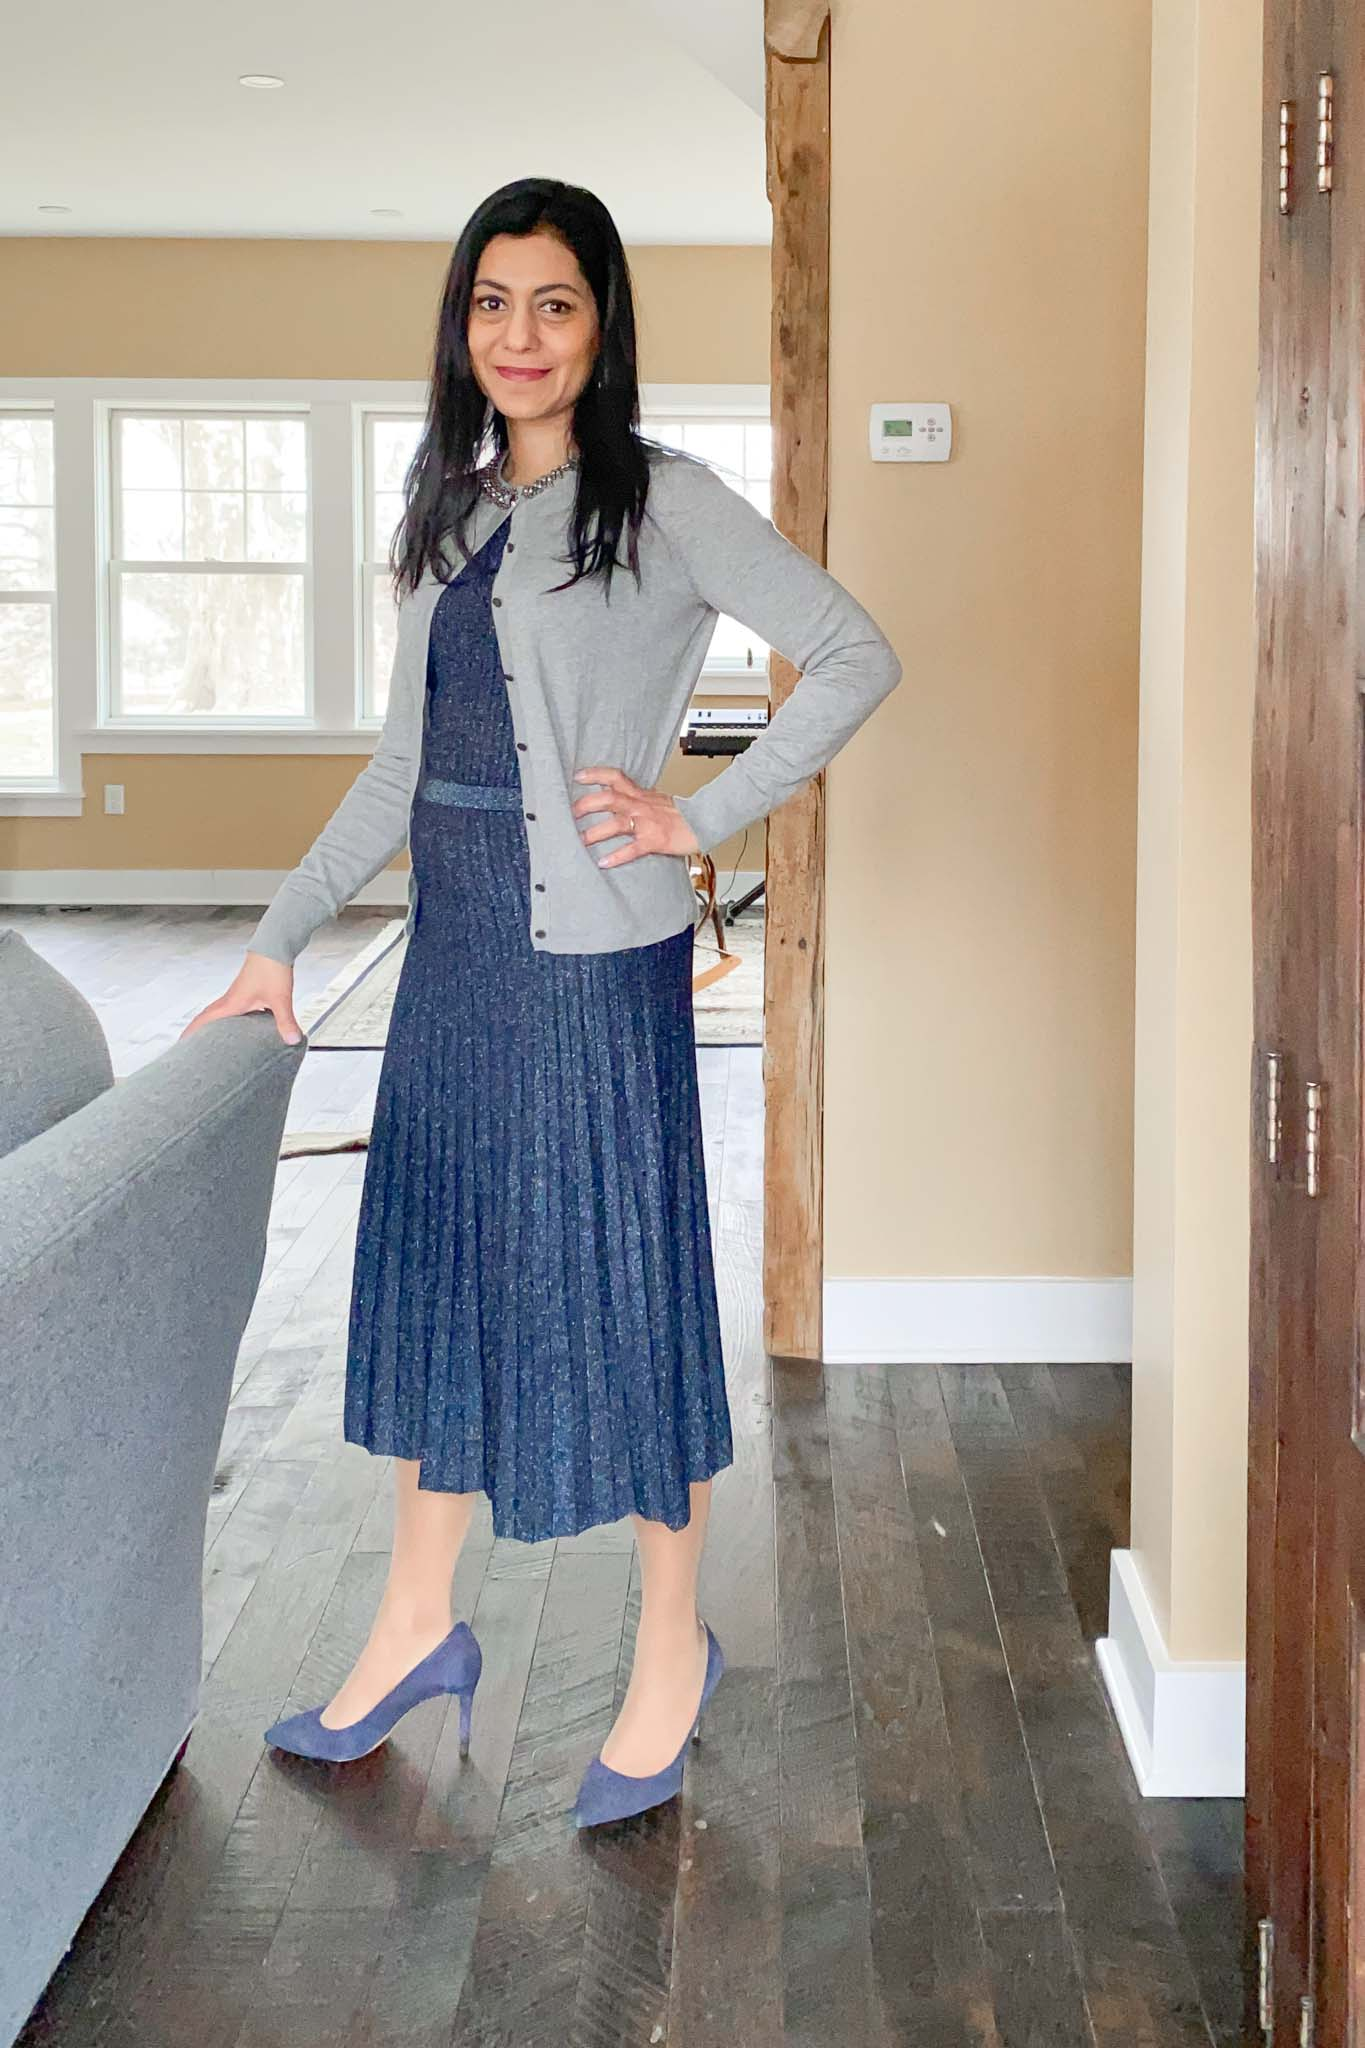 Sweater Dress With Cardigan